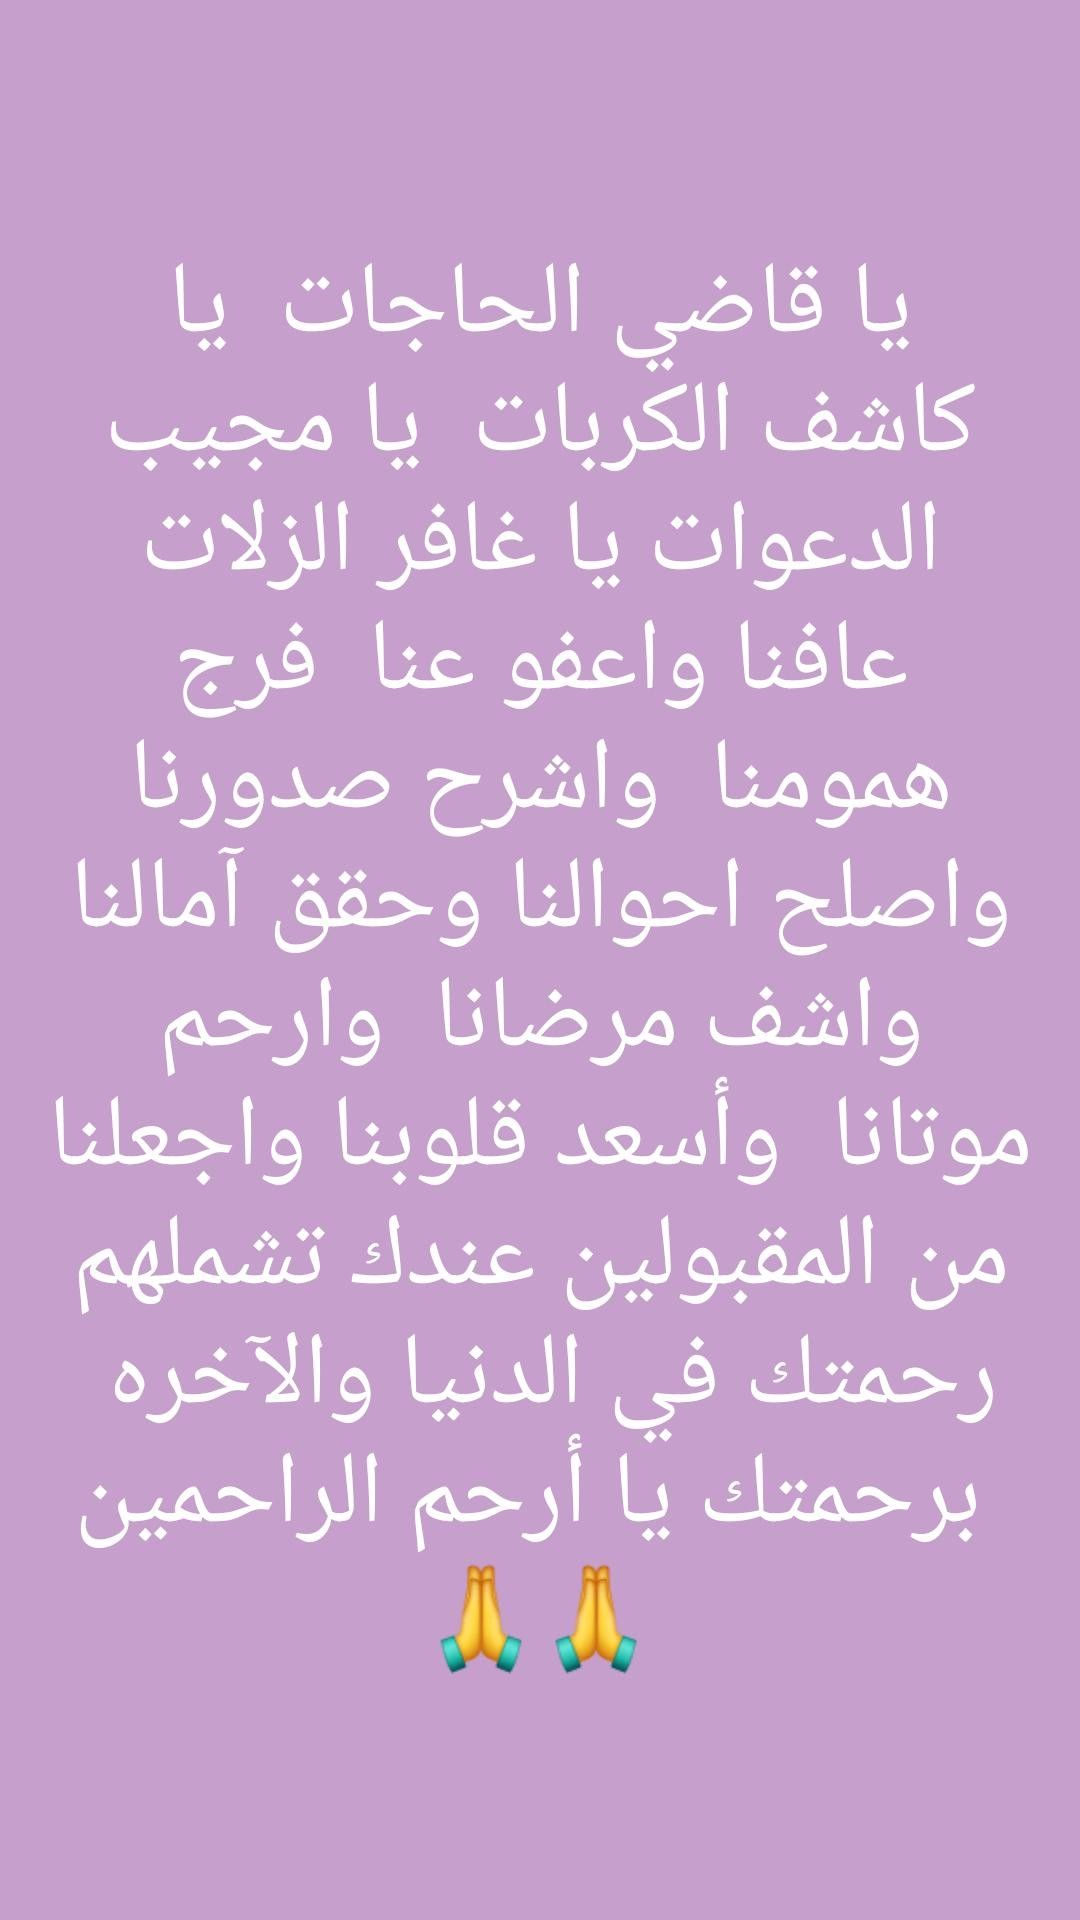 Pin By Lyan Hitham On Allah Islamic Love Quotes Islamic Quotes Duaa Islam